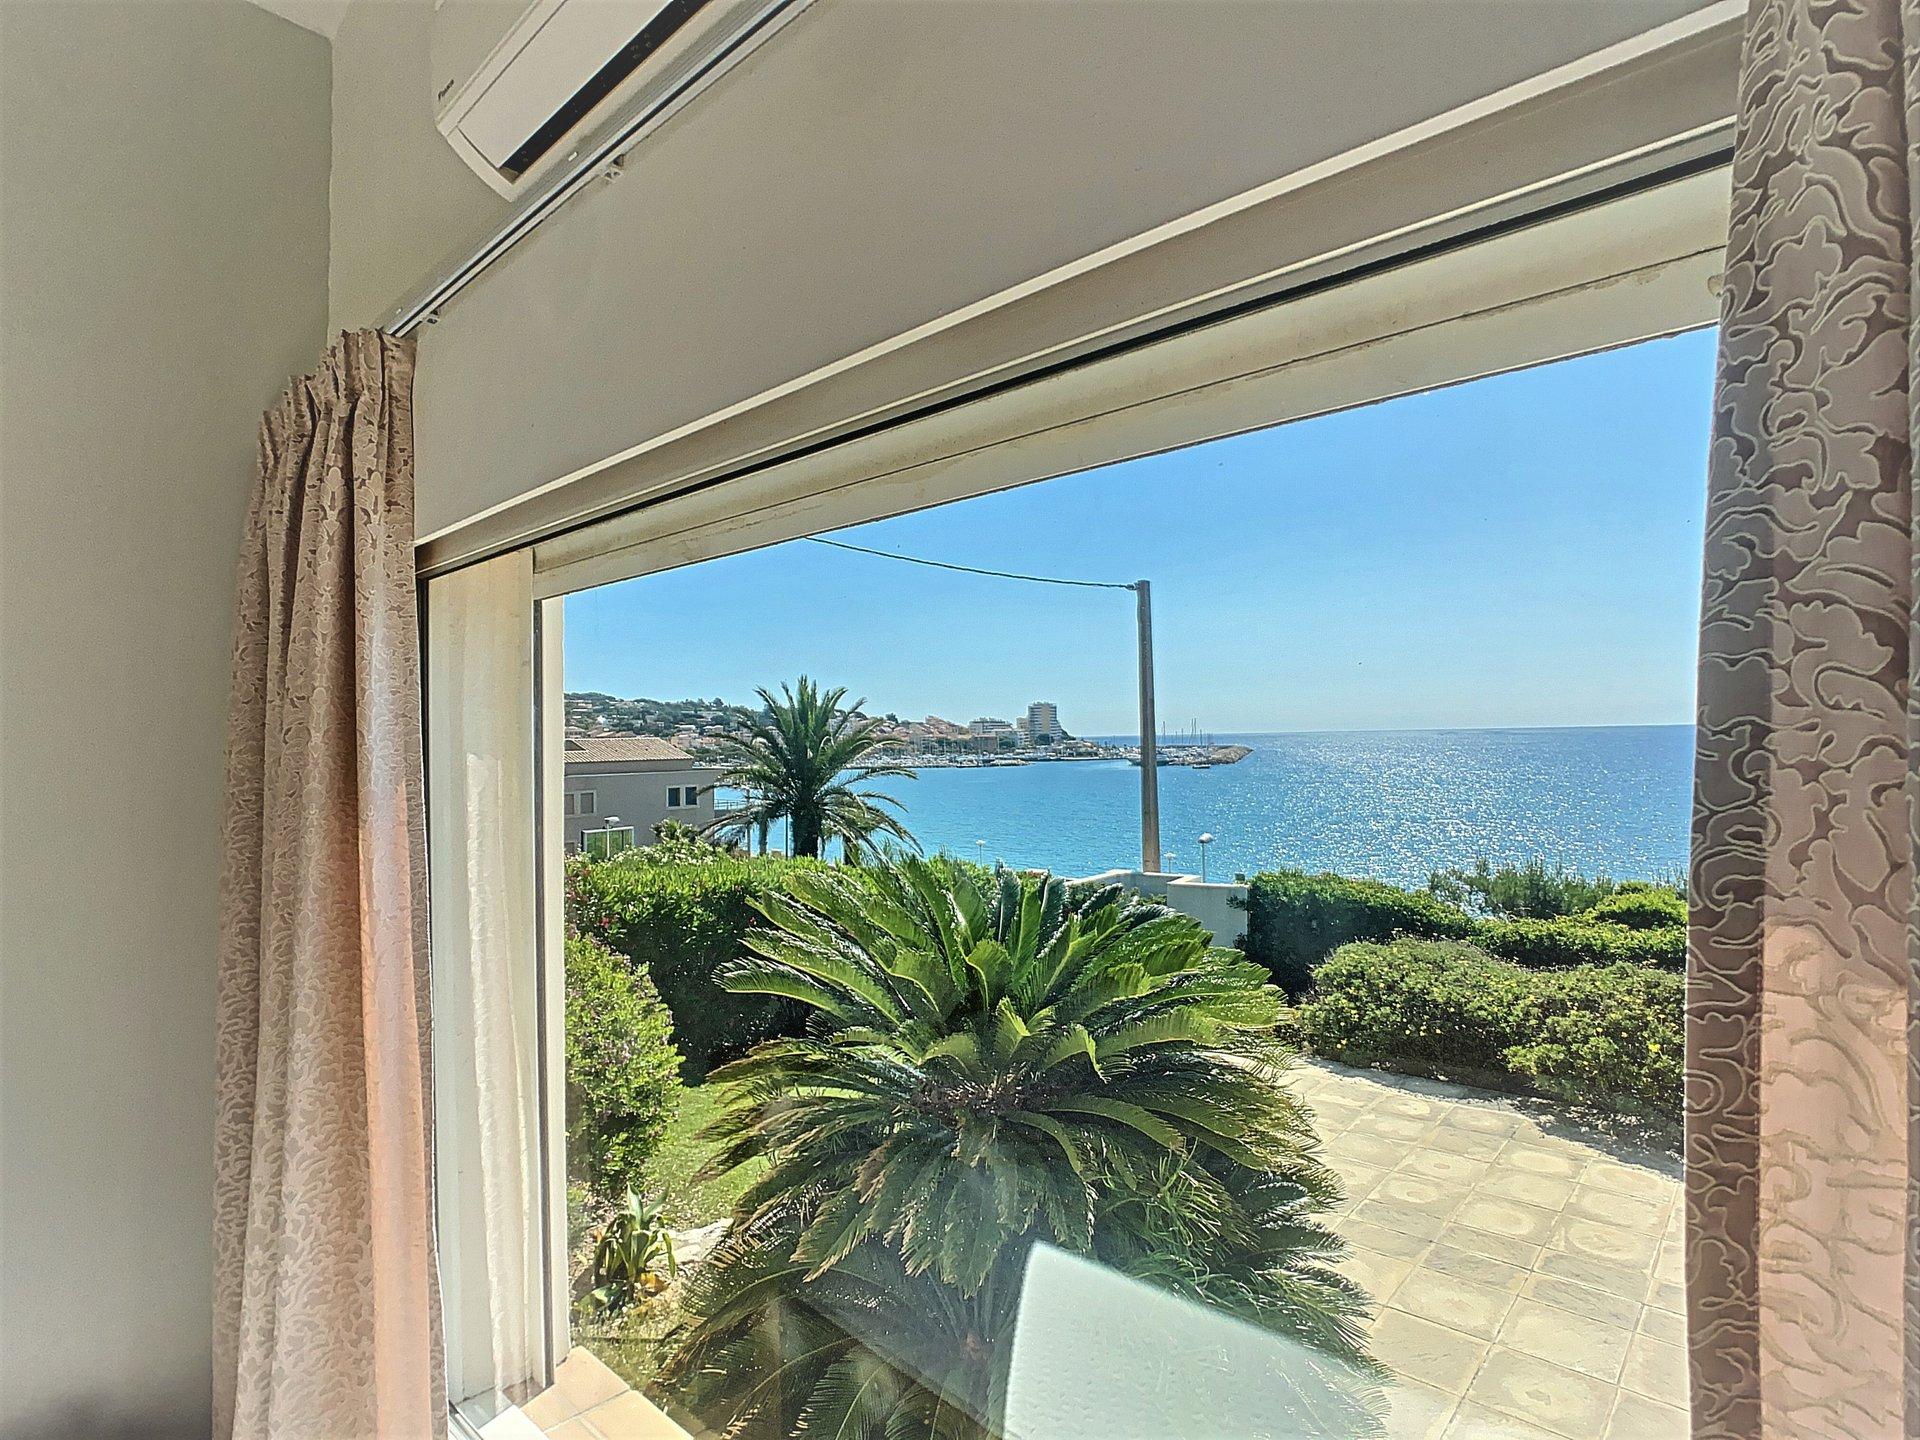 Villa a vendre avec magnifique vue mer Sainte Maxime